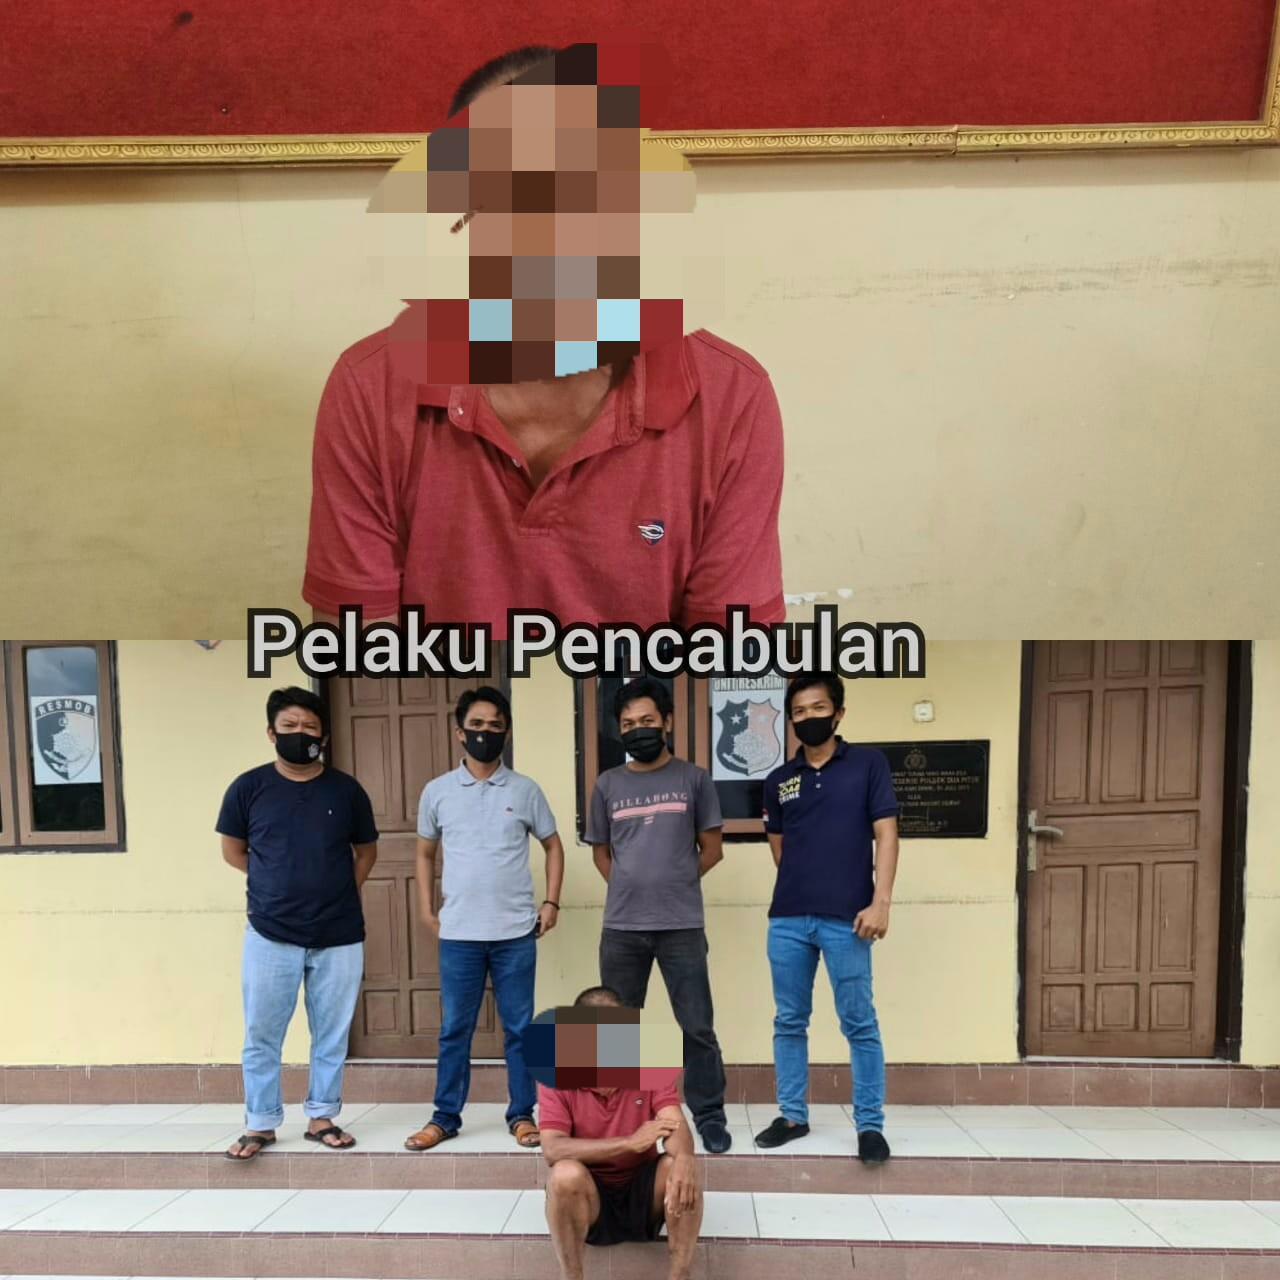 Pelaku tindak pidana Pencabulan ditangkap Polisi